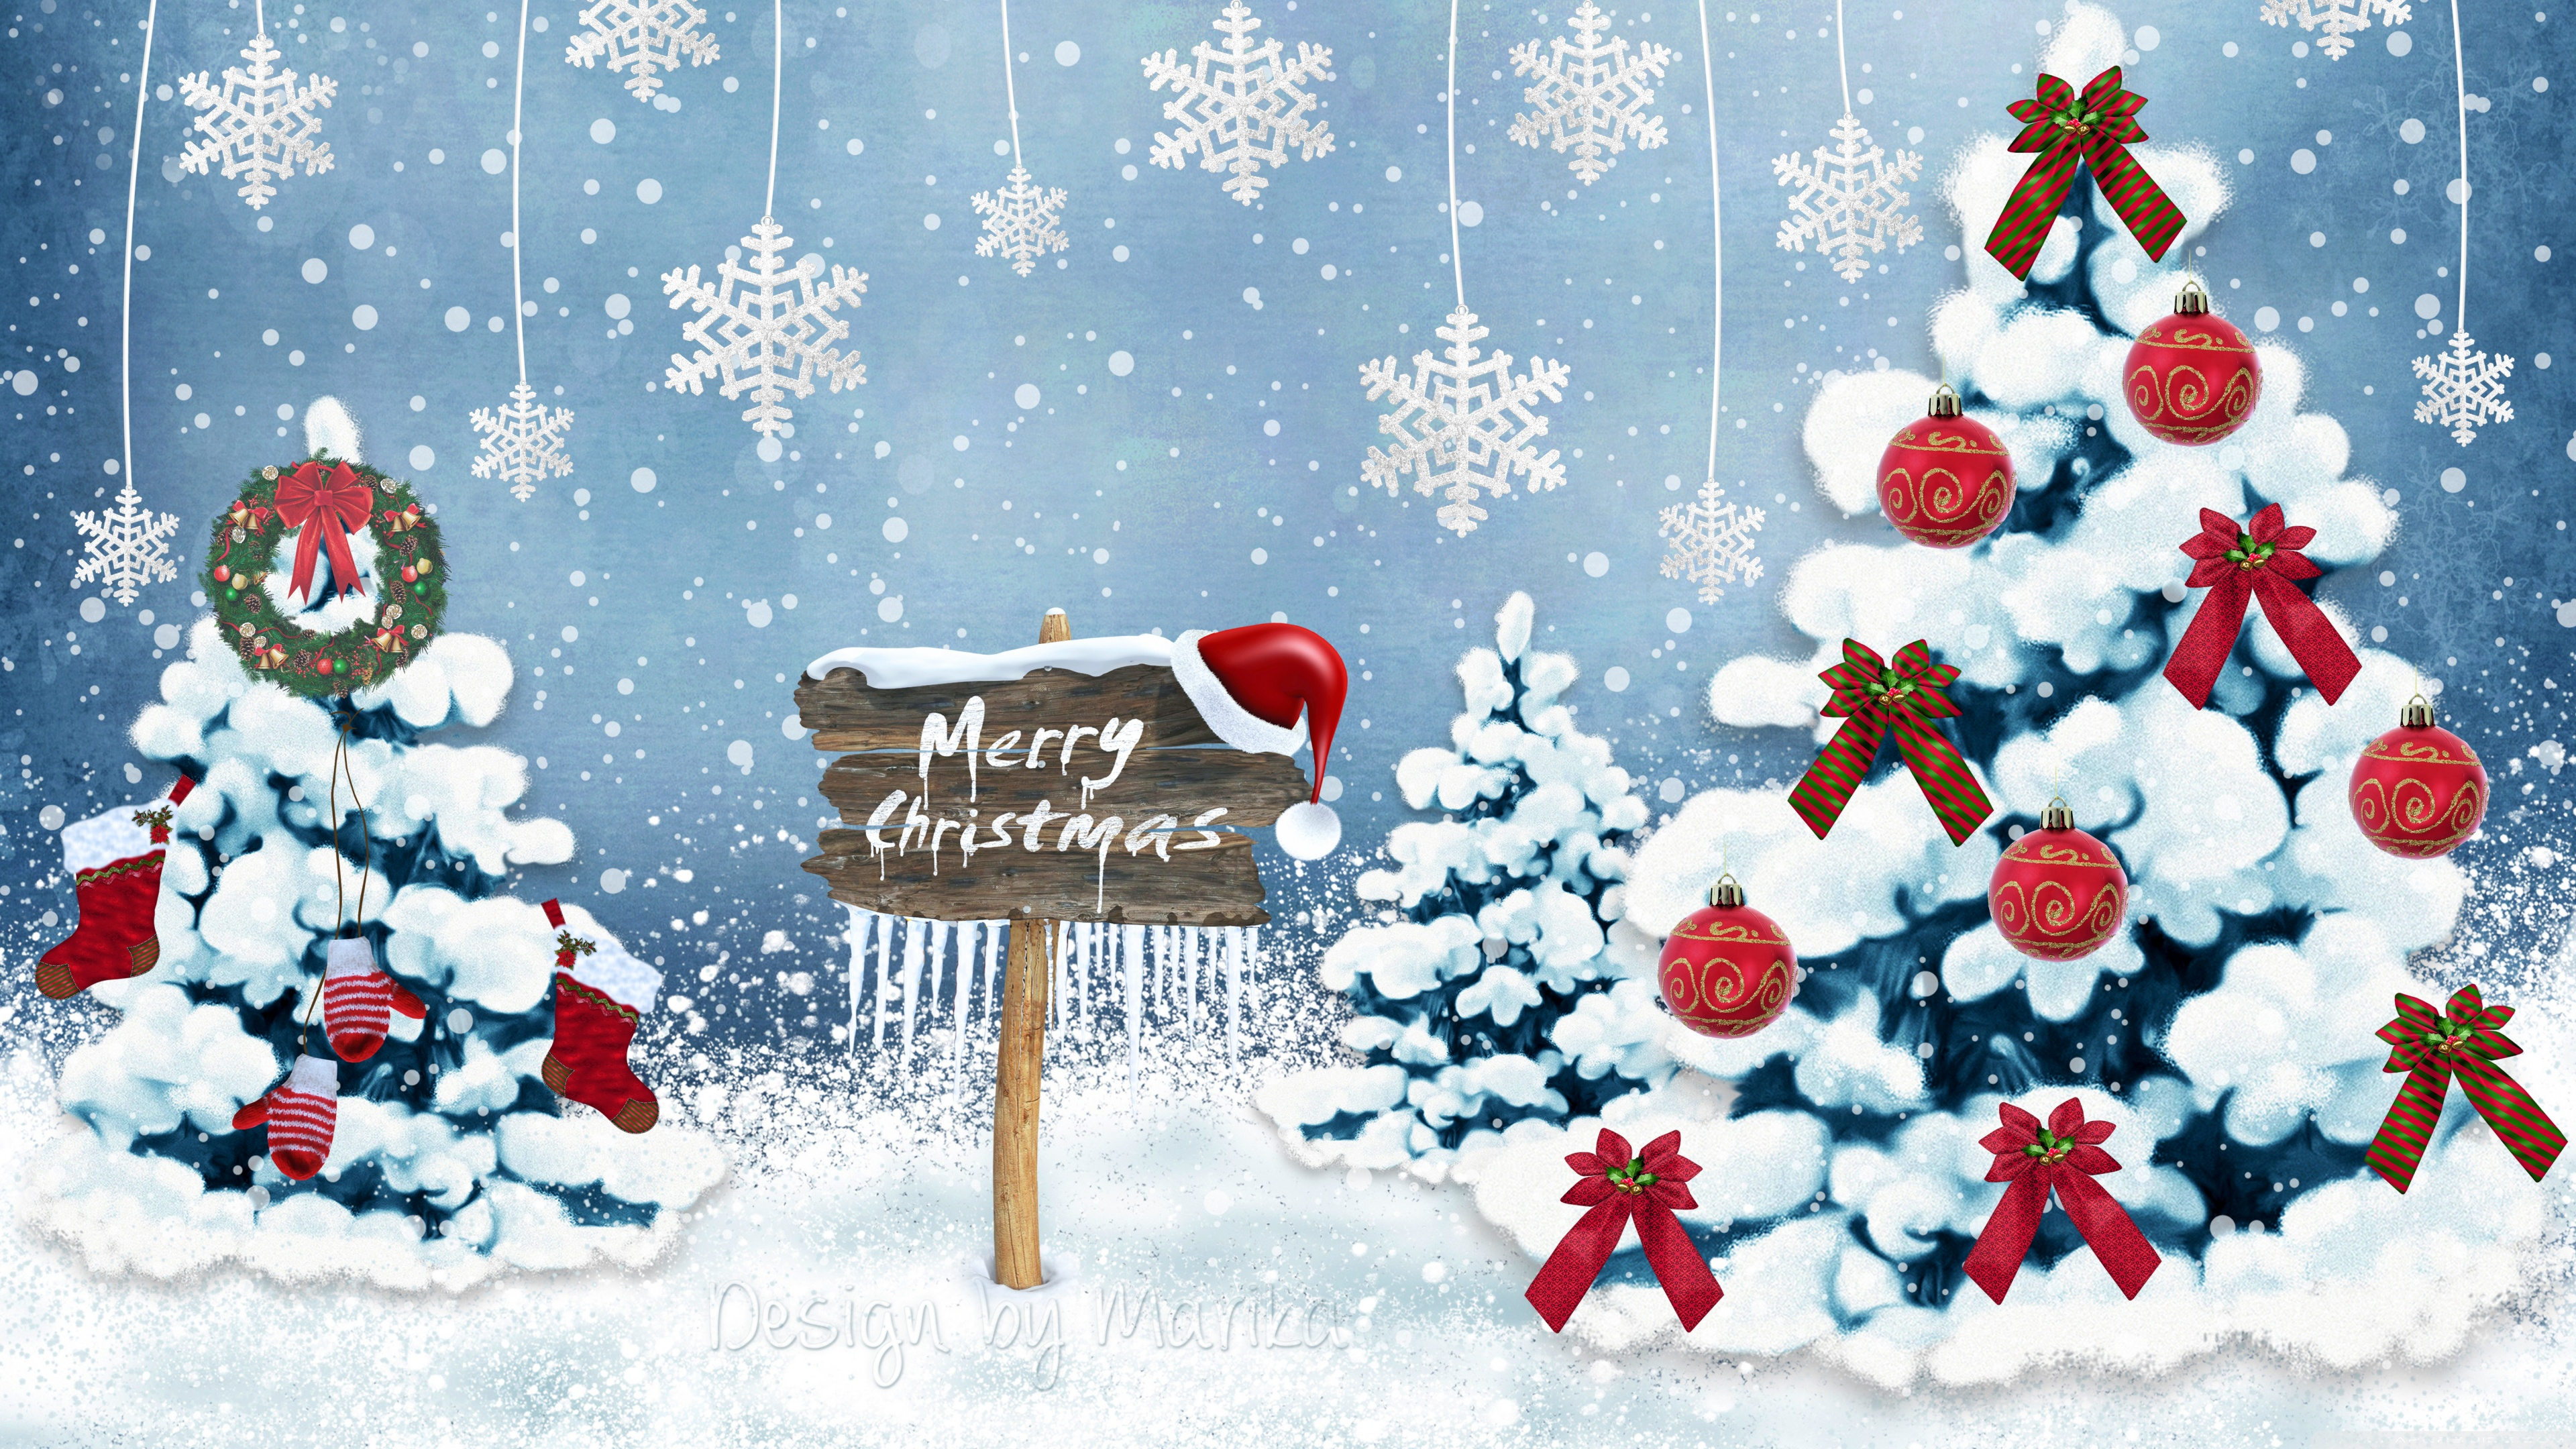 Merry Christmas 2014 Ultra HD Desktop Background Wallpaper for 4K 3840x2160